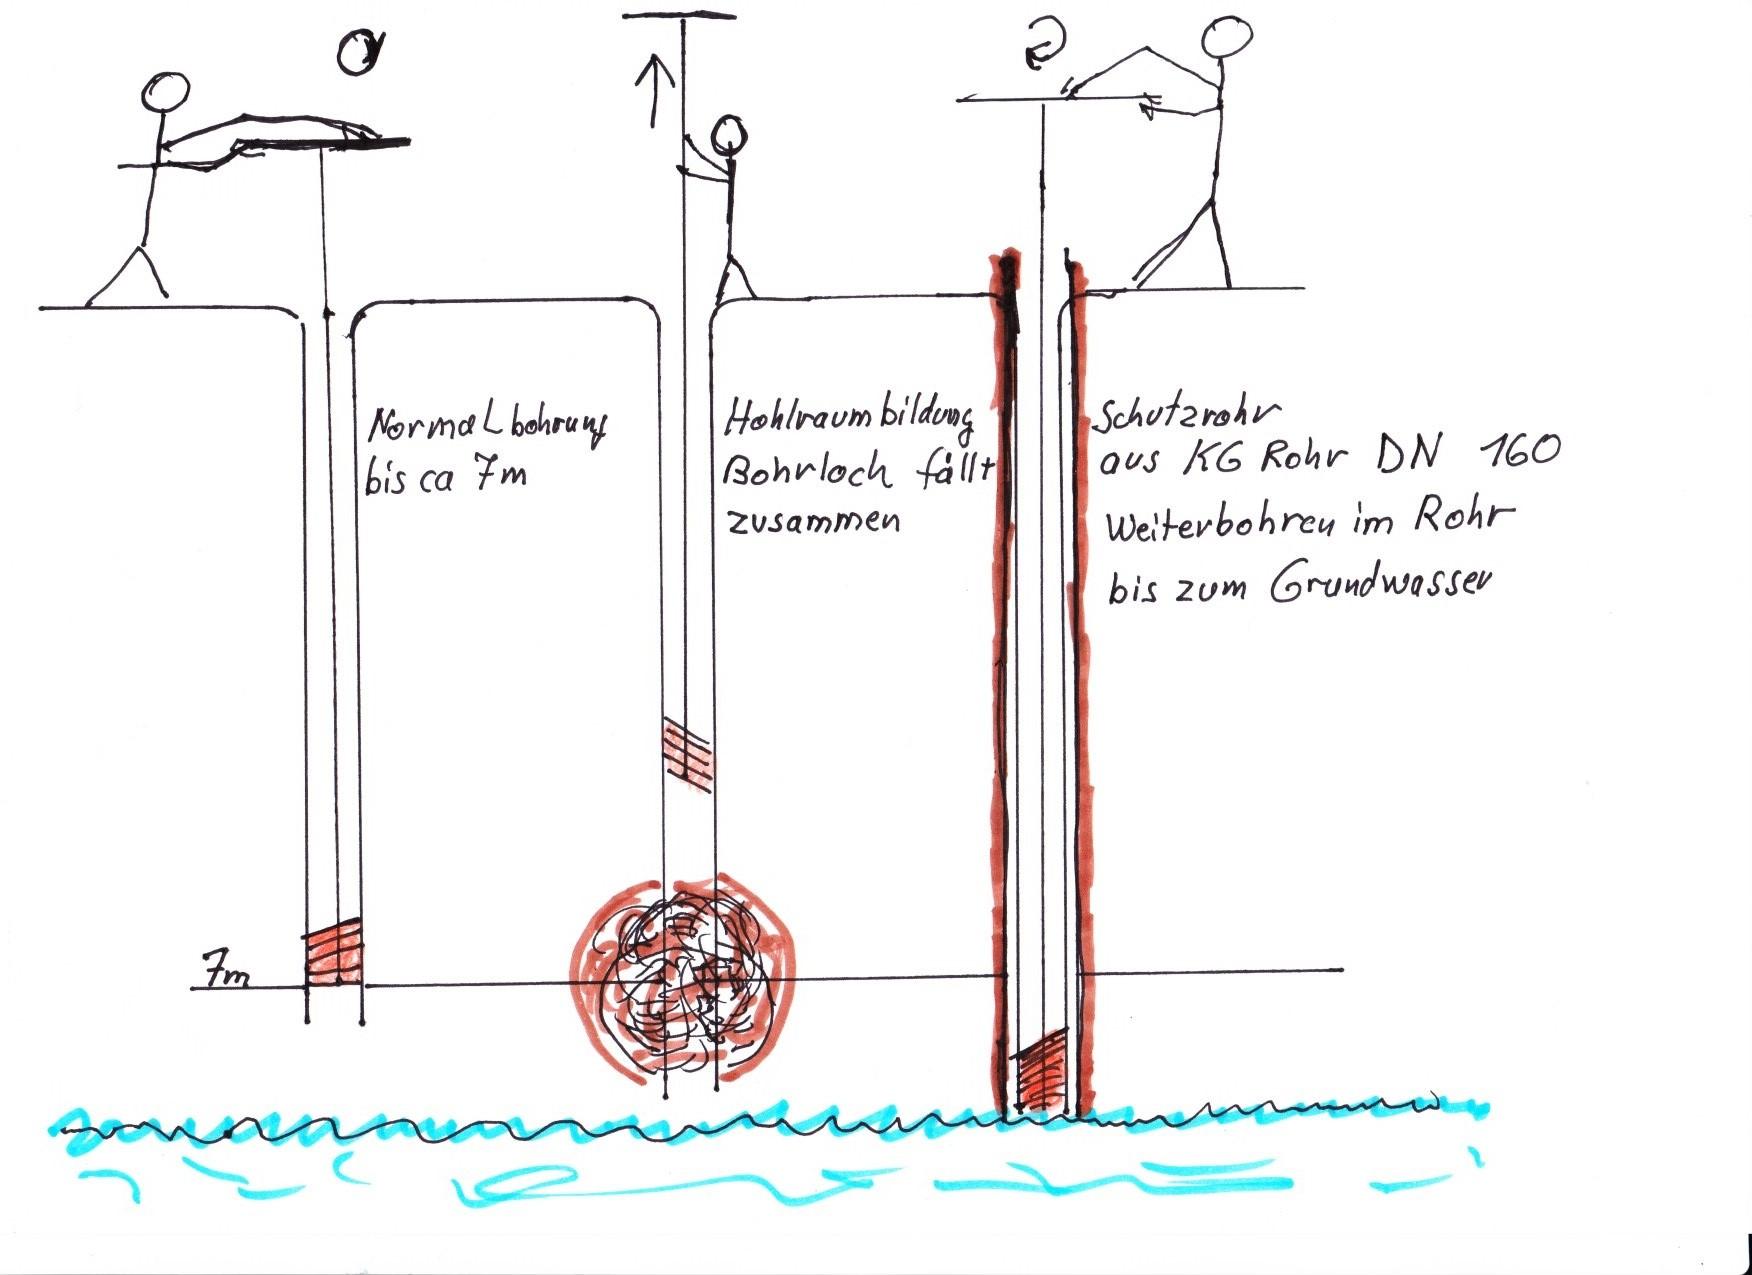 Fabulous KG-Rohr als Schutzrohr für den Brunnenbohrer macht Sinn! VU59